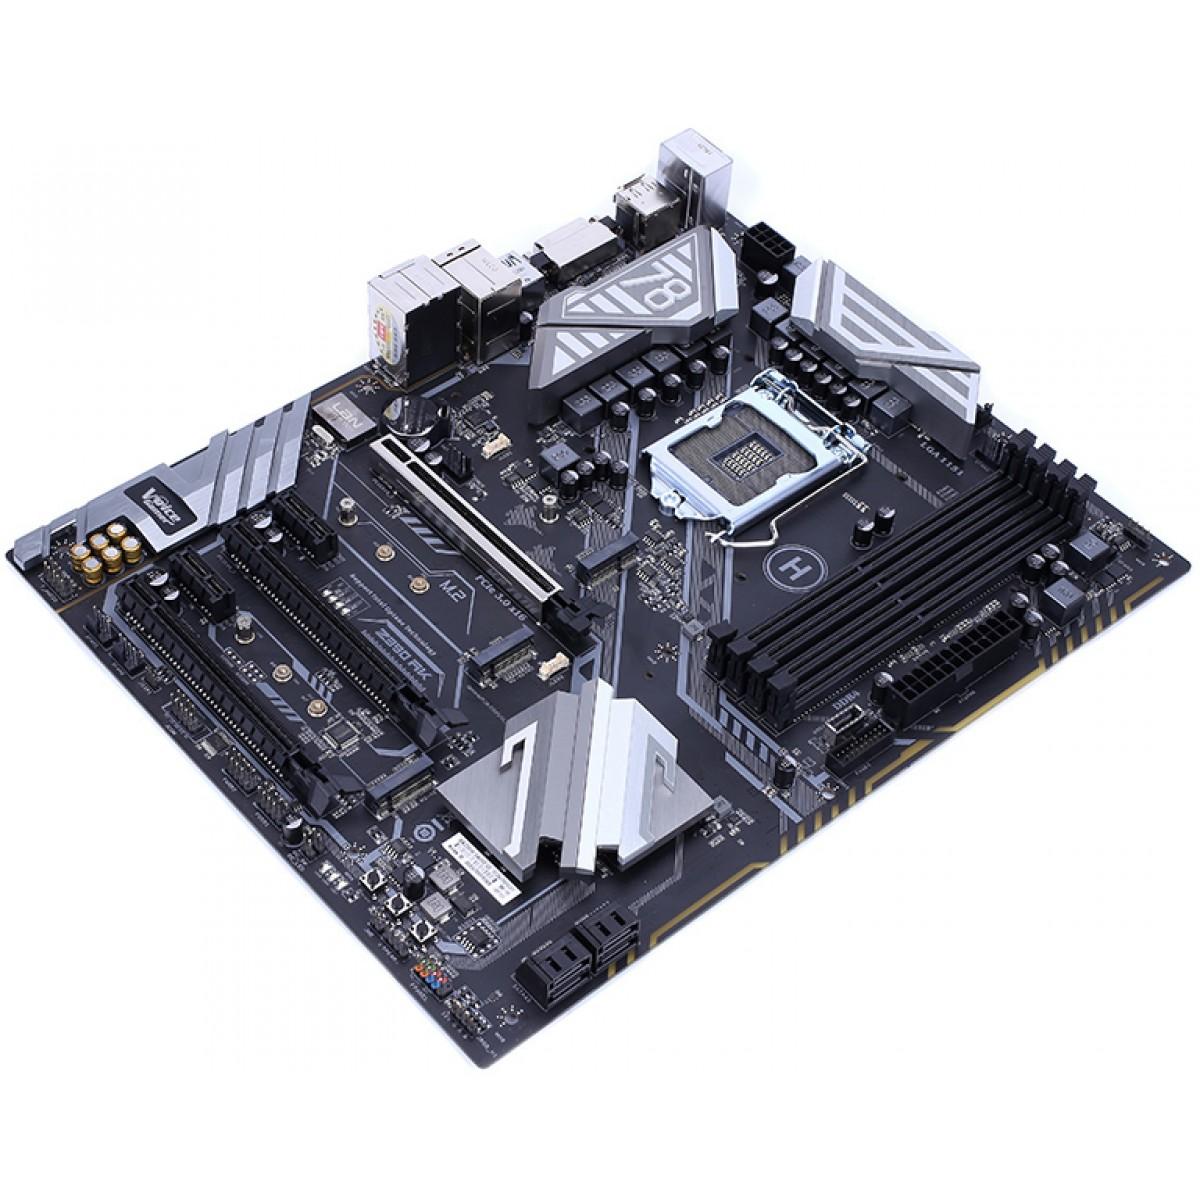 Placa Mãe Colorful Battle-AX Z390AK Gaming V20, Chipset Z390, Intel LGA 1151, ATX, DDR4